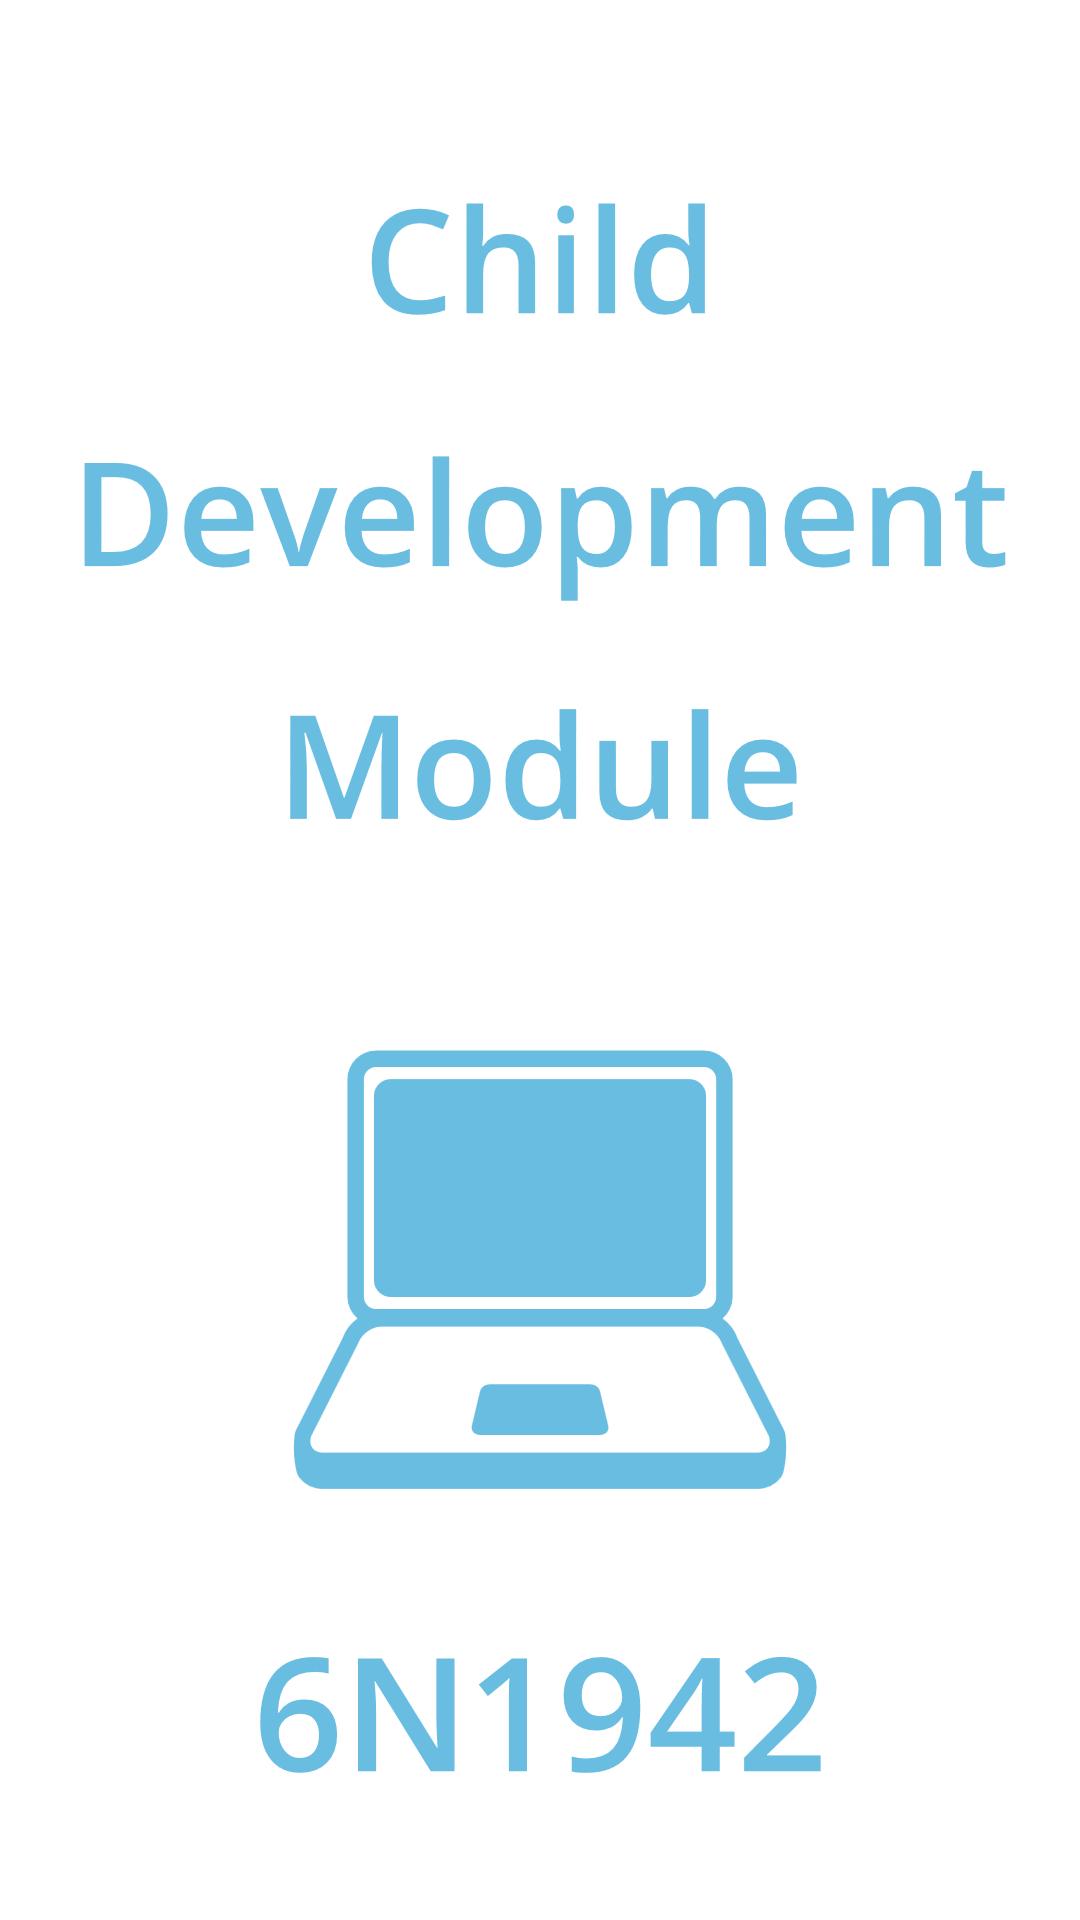 child development module